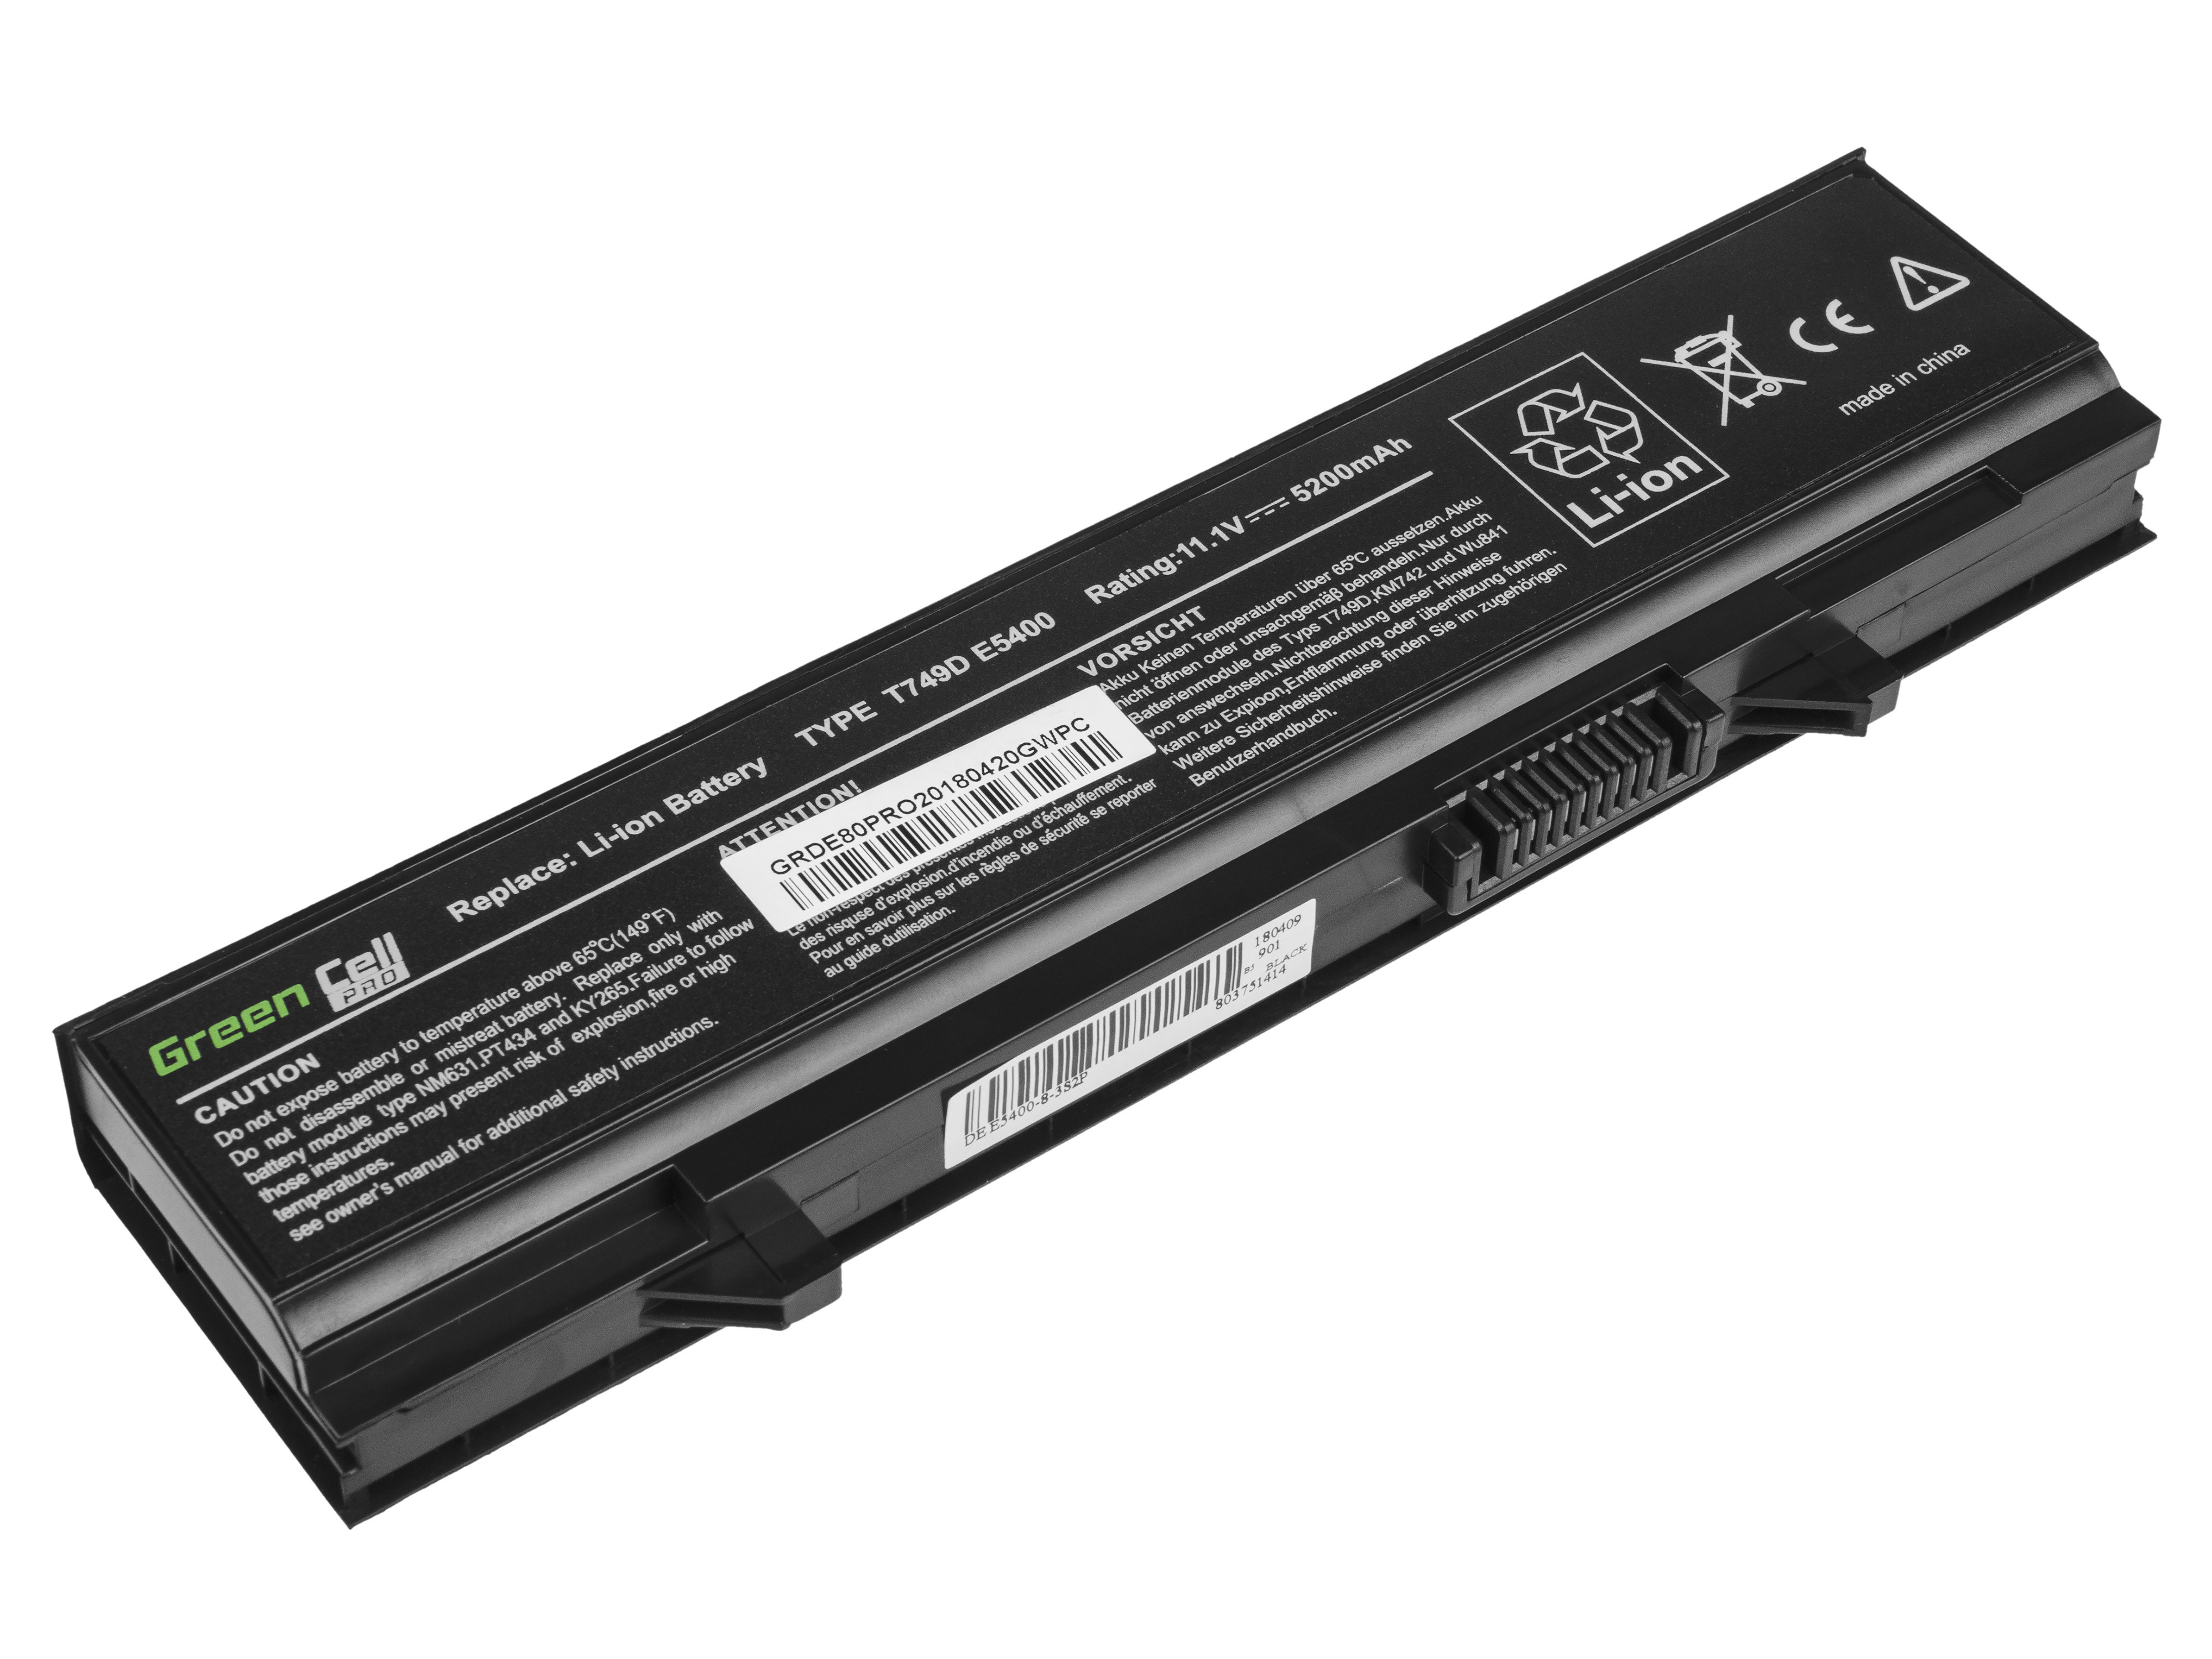 Green Cell PRO Battery for Dell Latitude E5400 E5410 E5500 E5510 / 11,1V 5200mAh